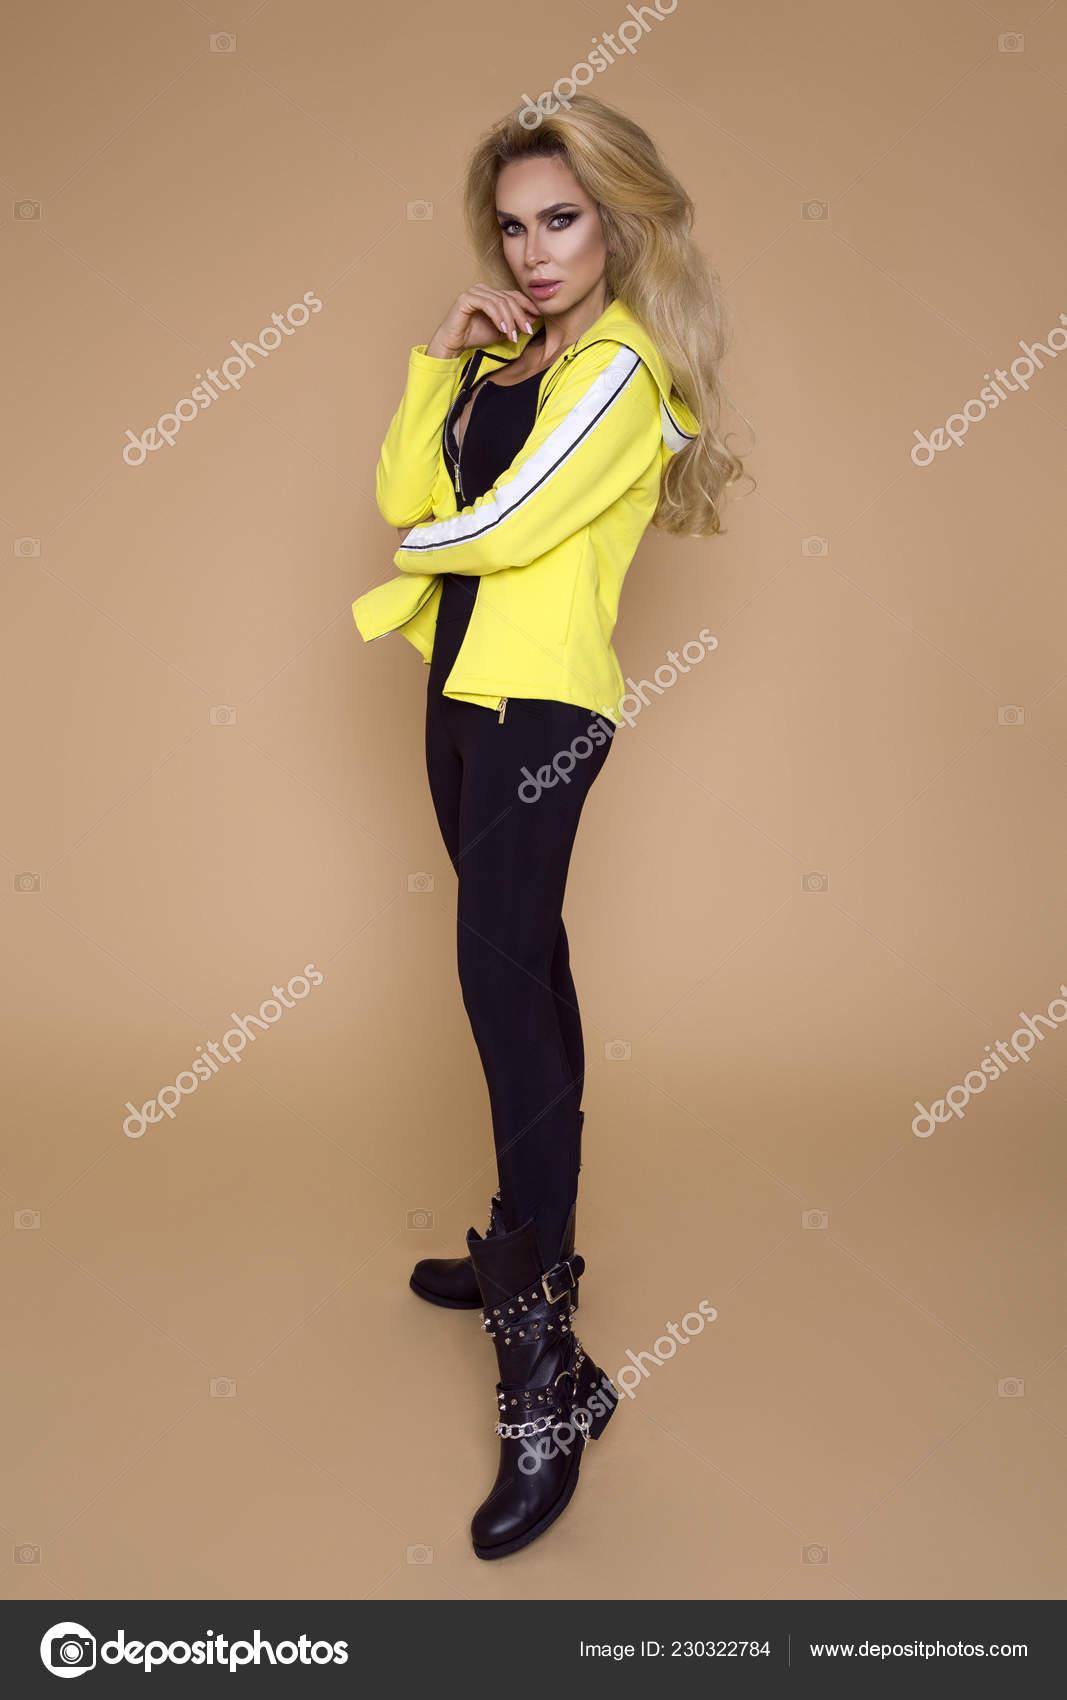 ecfa83e6ca91 Όμορφη Νεαρή Γυναίκα Μοντέλο Ένα Σπορ Ρούχα Φούτερ Και Κολάν ...